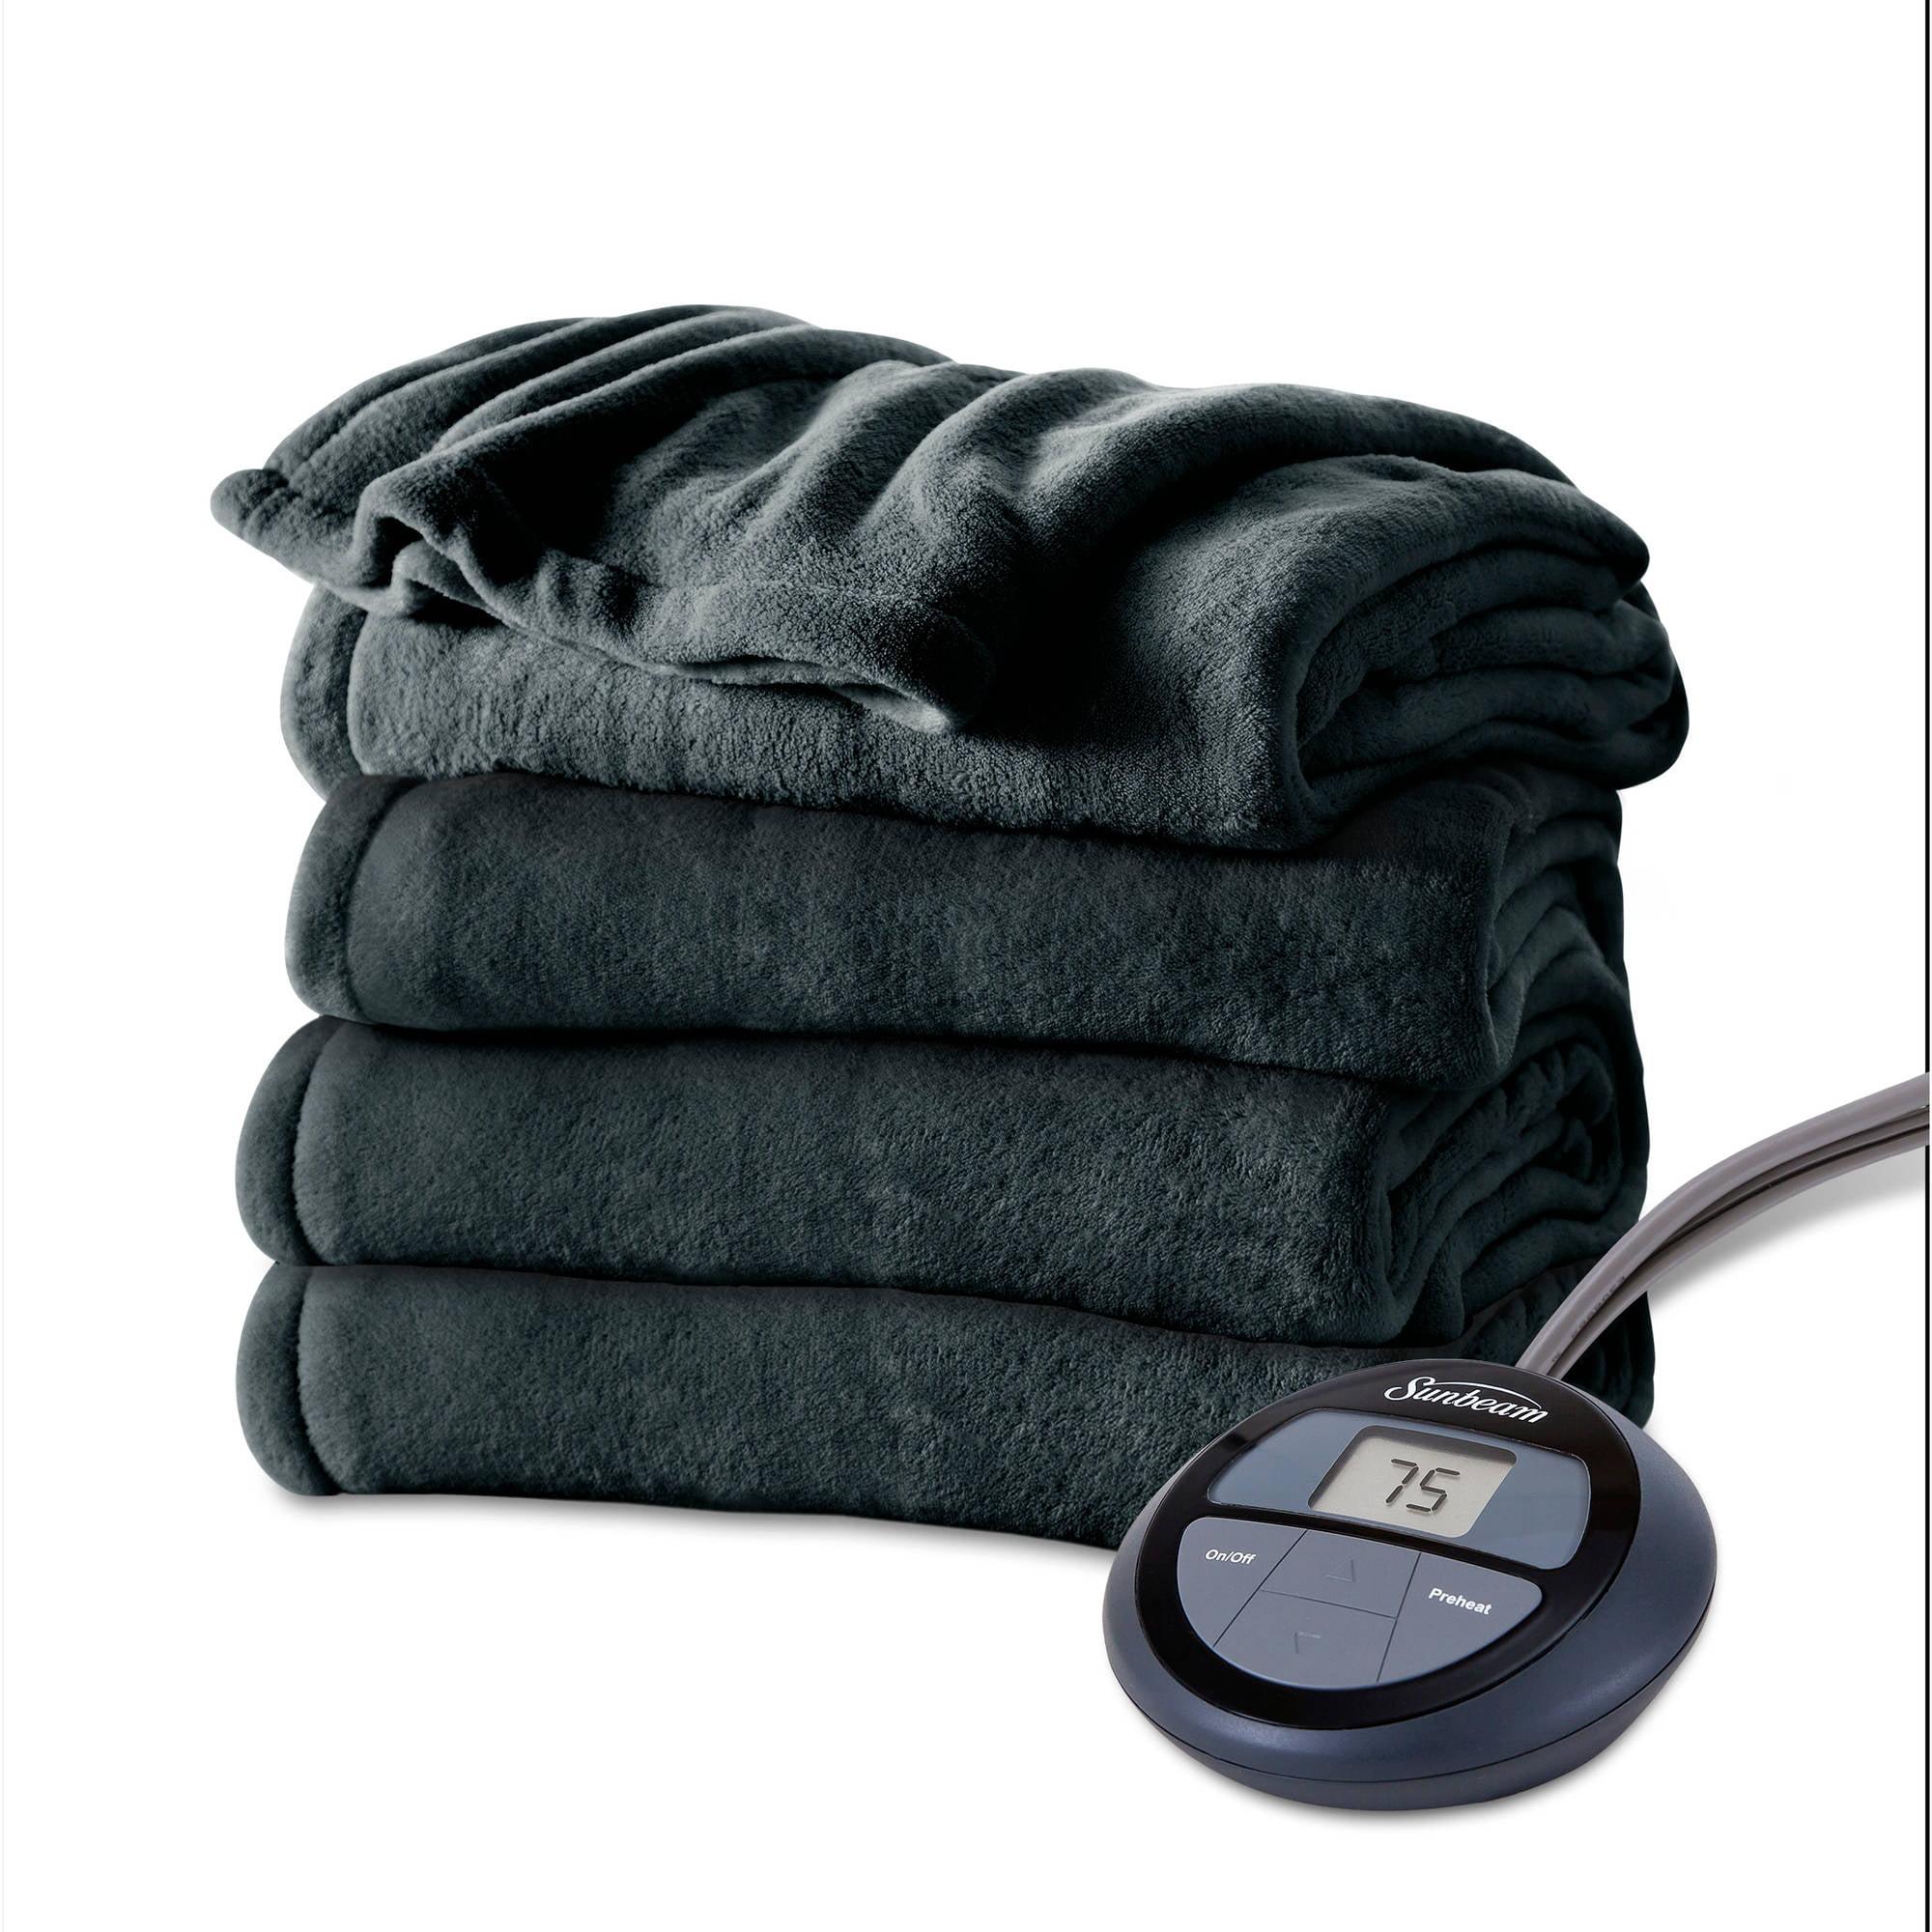 b7f93cf62d Sunbeam Electric Heated Microplush Blanket (BSM9KTSR53116A0) - Walmart.com